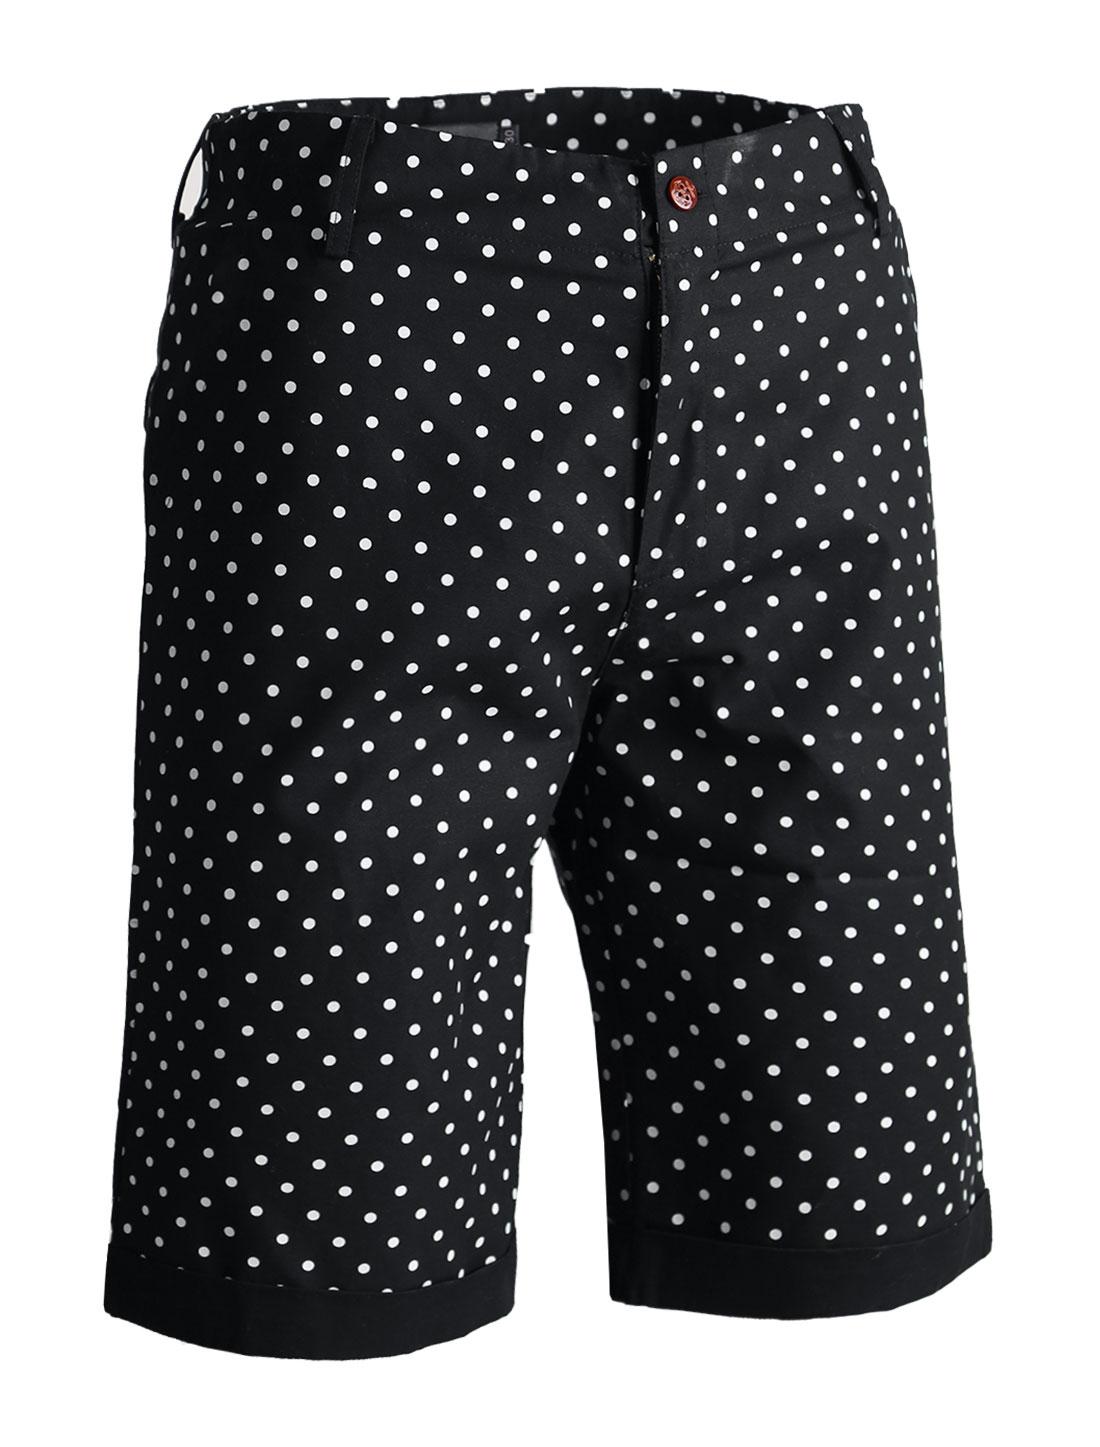 Men Polka Dot Print Cuffed Slim Chinos Black W34